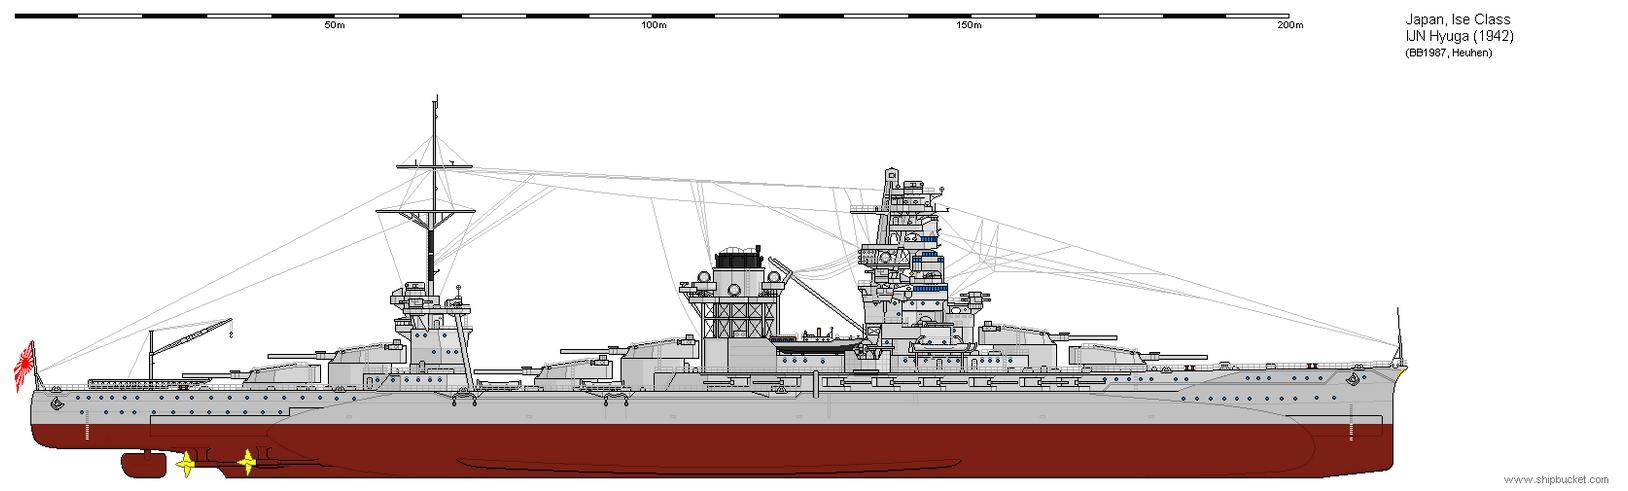 Resultado de imagen para ise class battleship